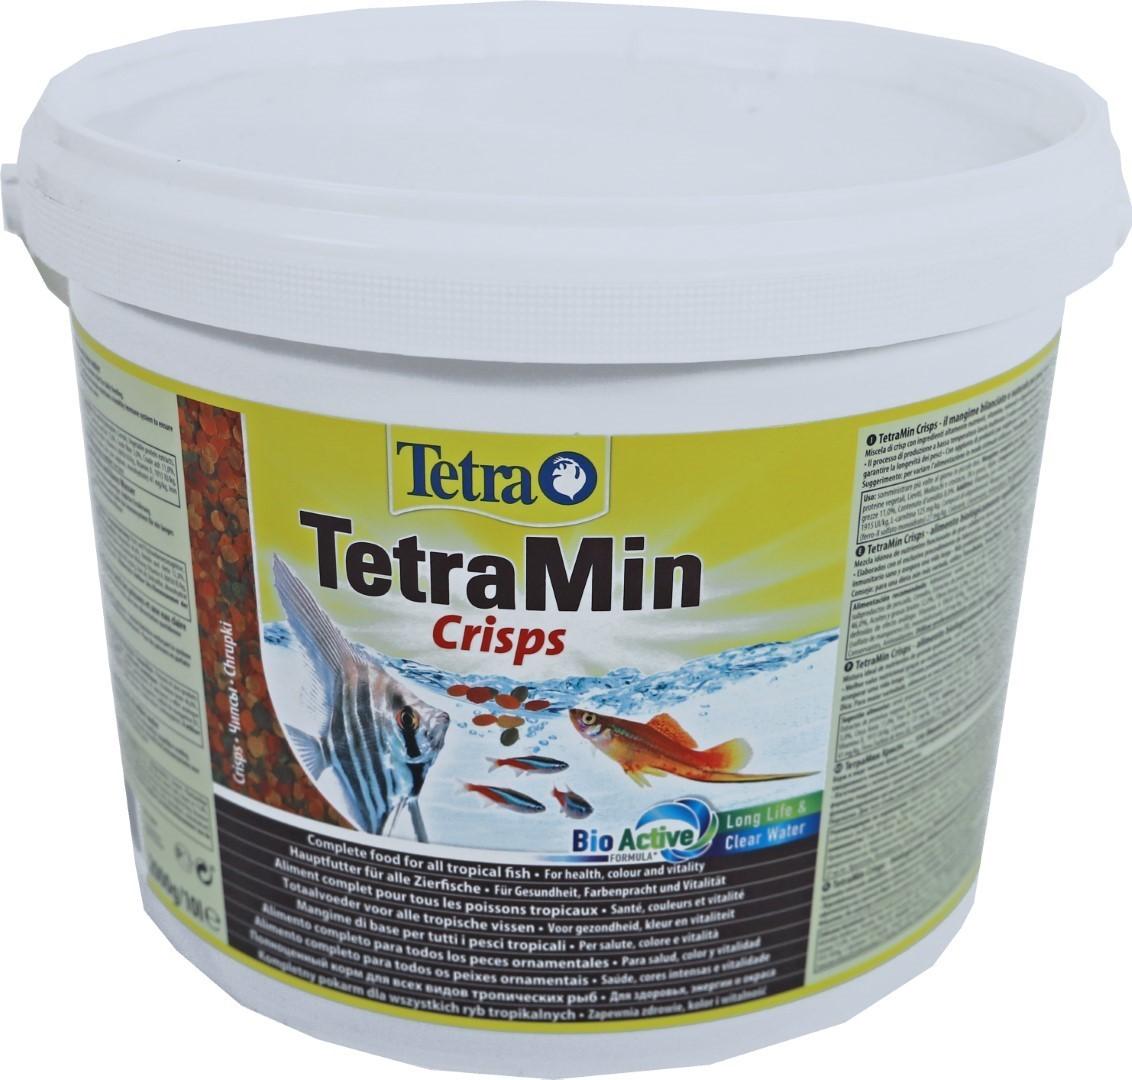 Tetra Min Pro crisps 10 liter emmer